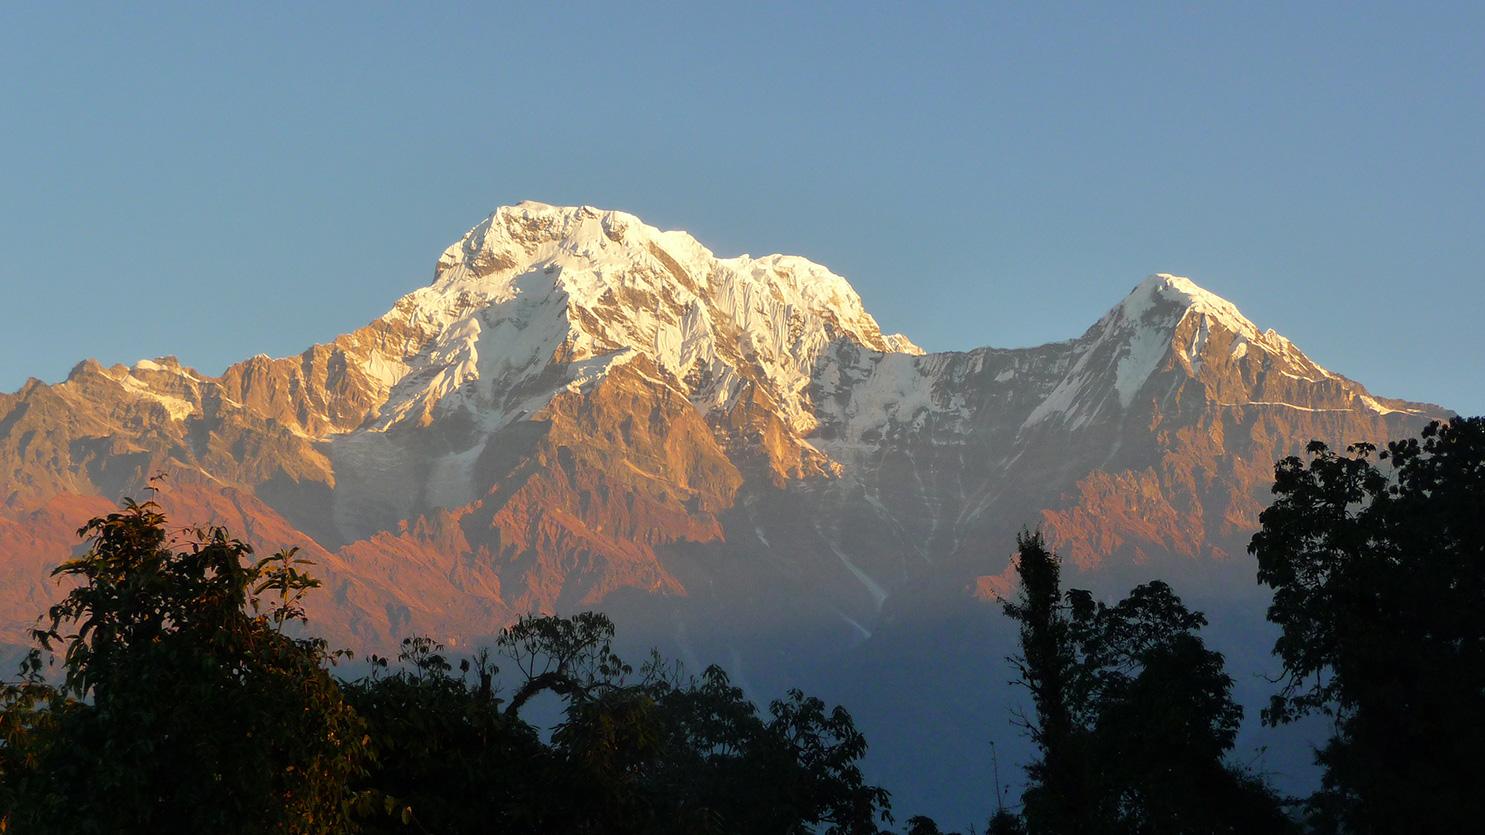 circuit du camp de base Annapurna, poon hill, mardi himal - trekking, trek, randonnée